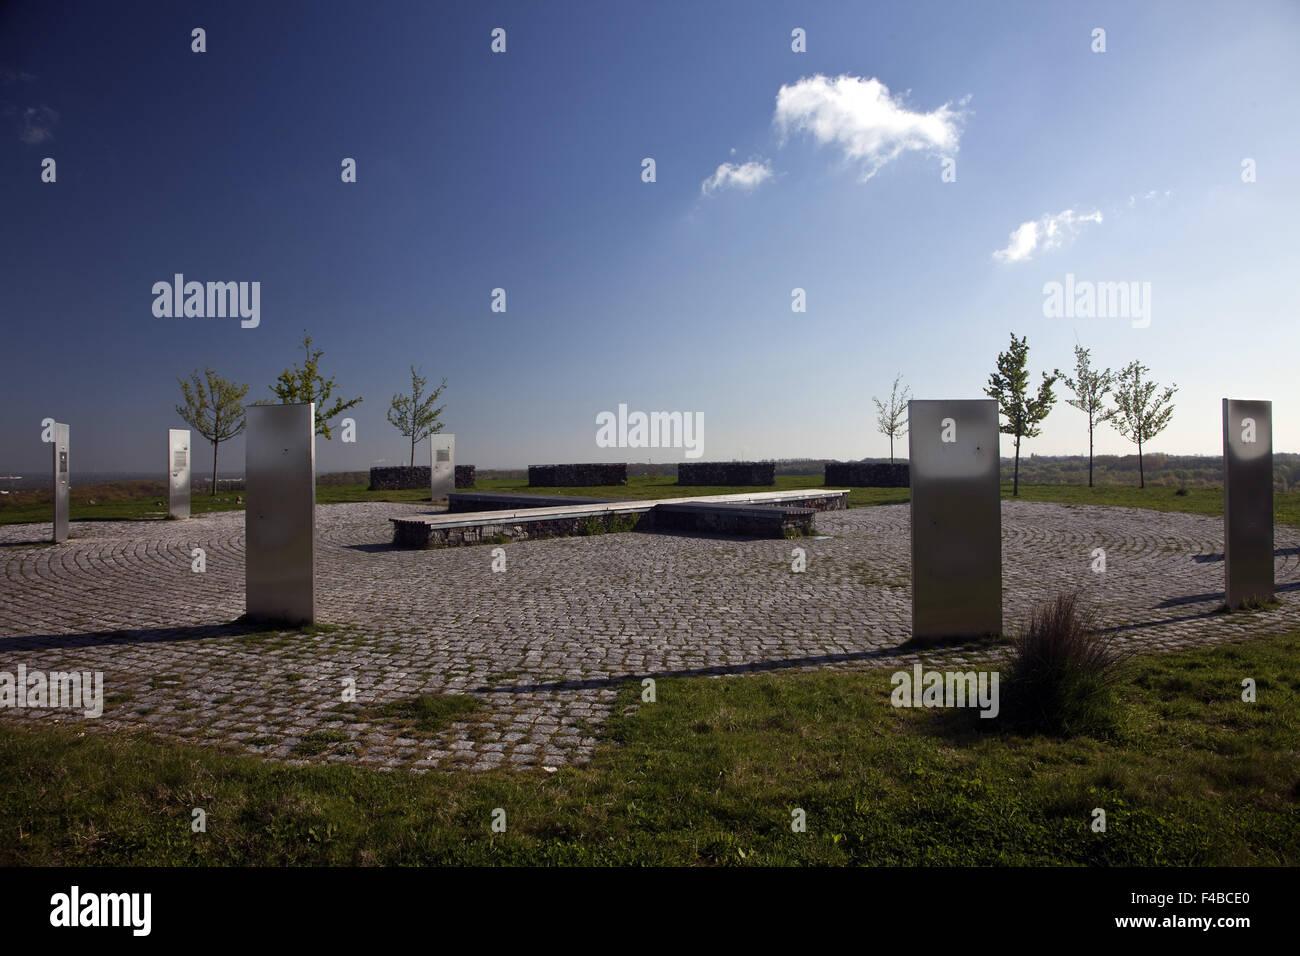 Tippelsberg, Bochum, Deutschland. - Stock Image